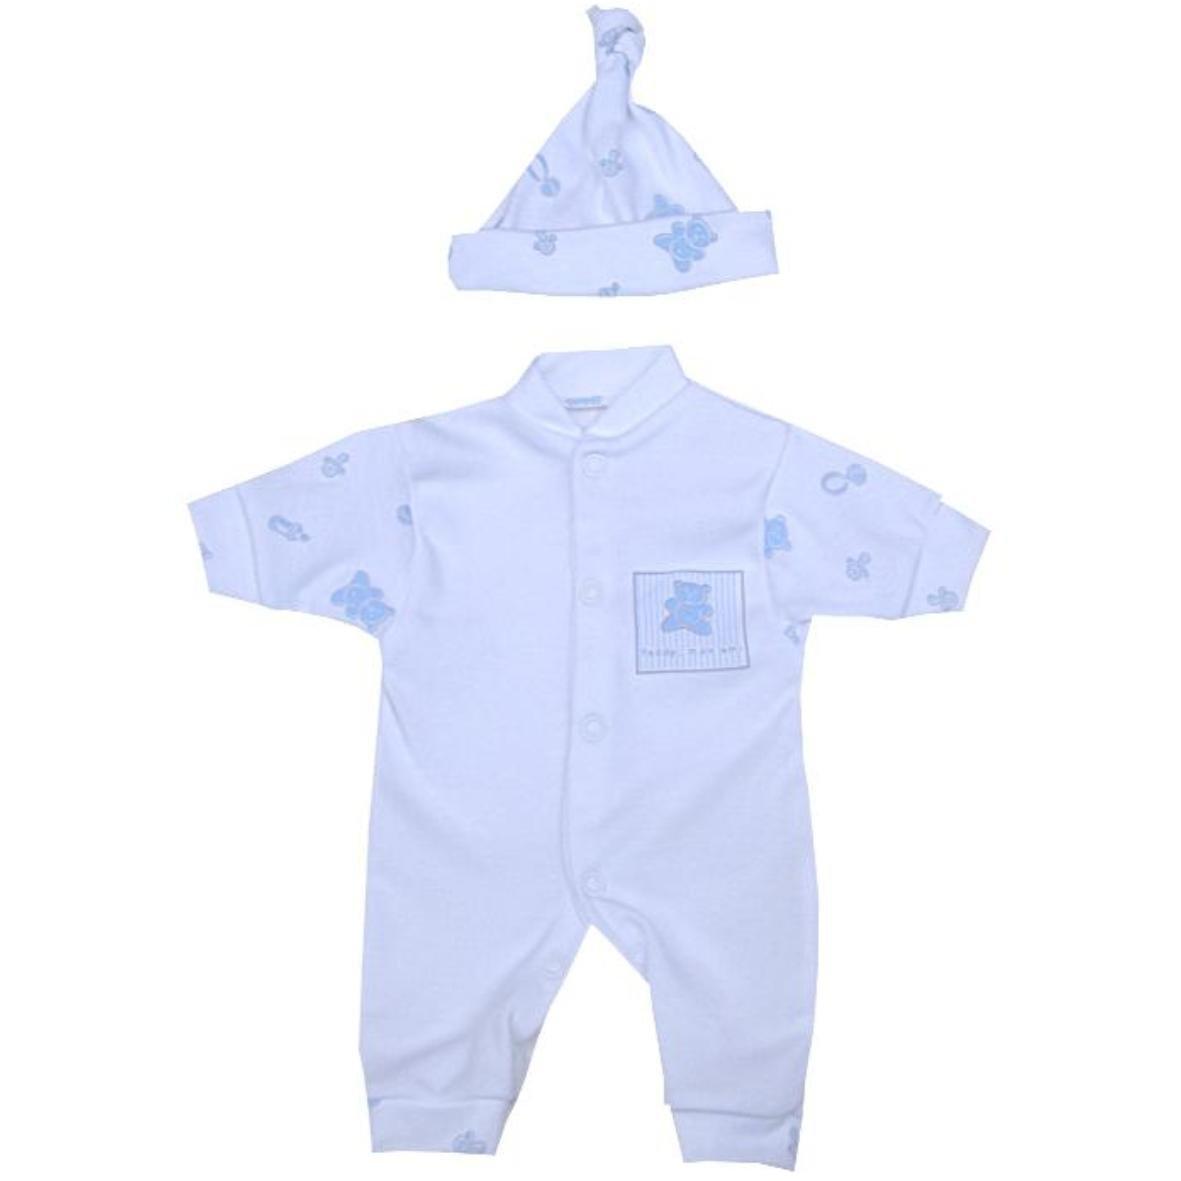 BabyPrem Baby Frühchen Kleidung Strampler Overall & Hut Set Jungen 32 - 50cm LB041BTA/BSD